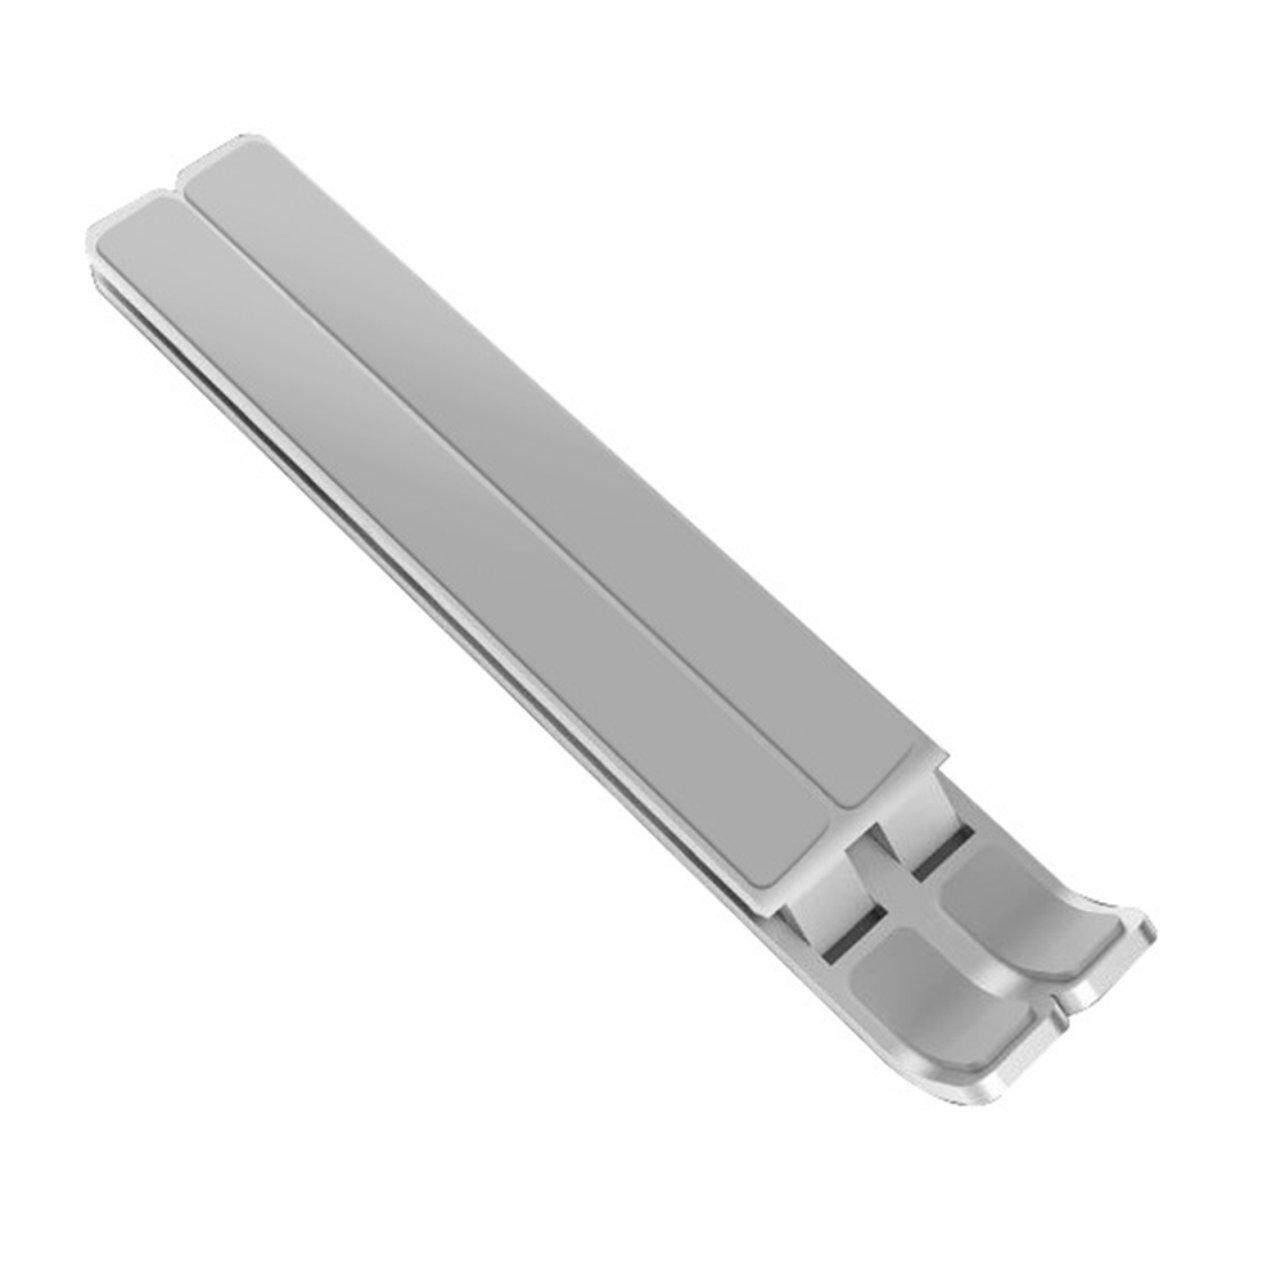 Hot Sales Aluminum Alloy Portable Folding Laptop Bracket Ultra-thin Lifting Bracket